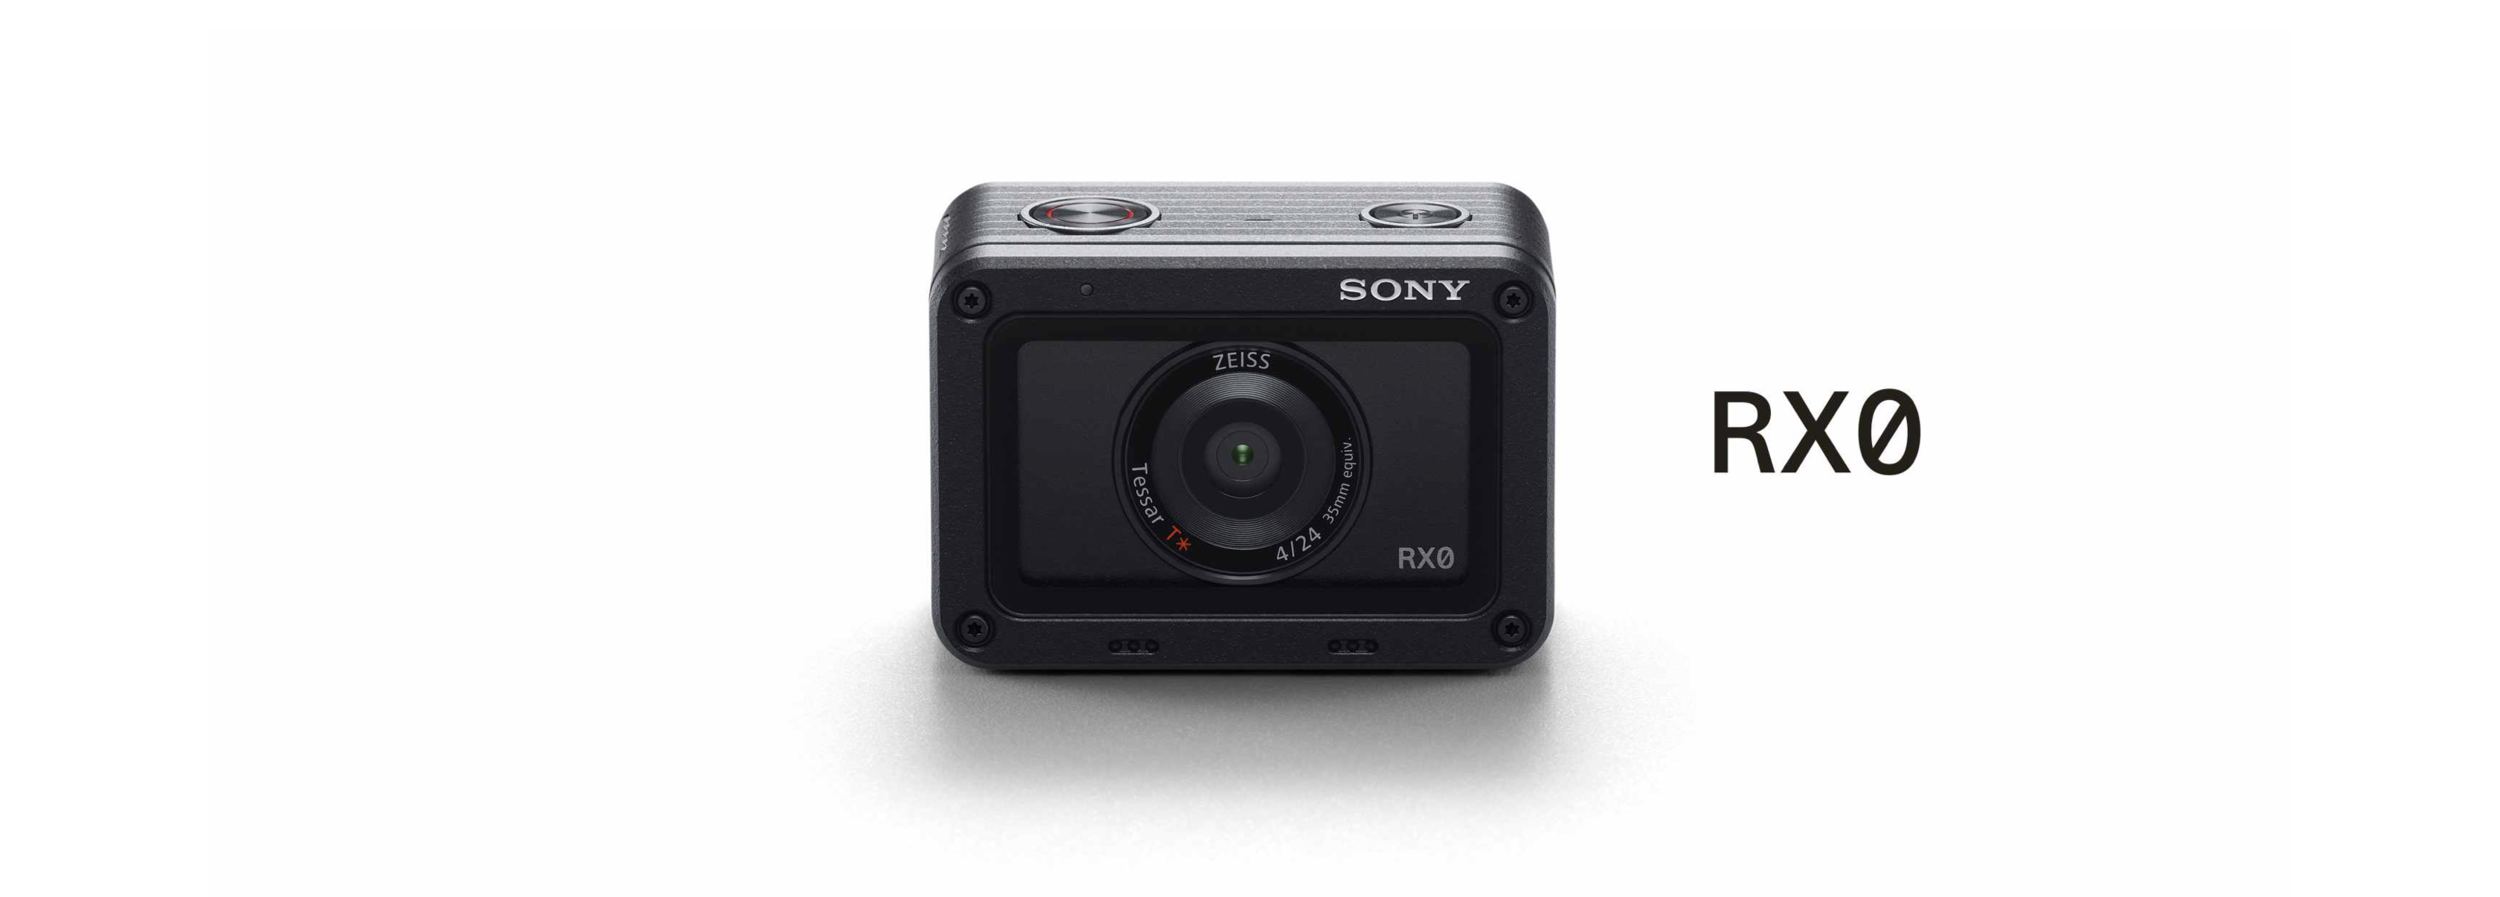 Image by Sony.com